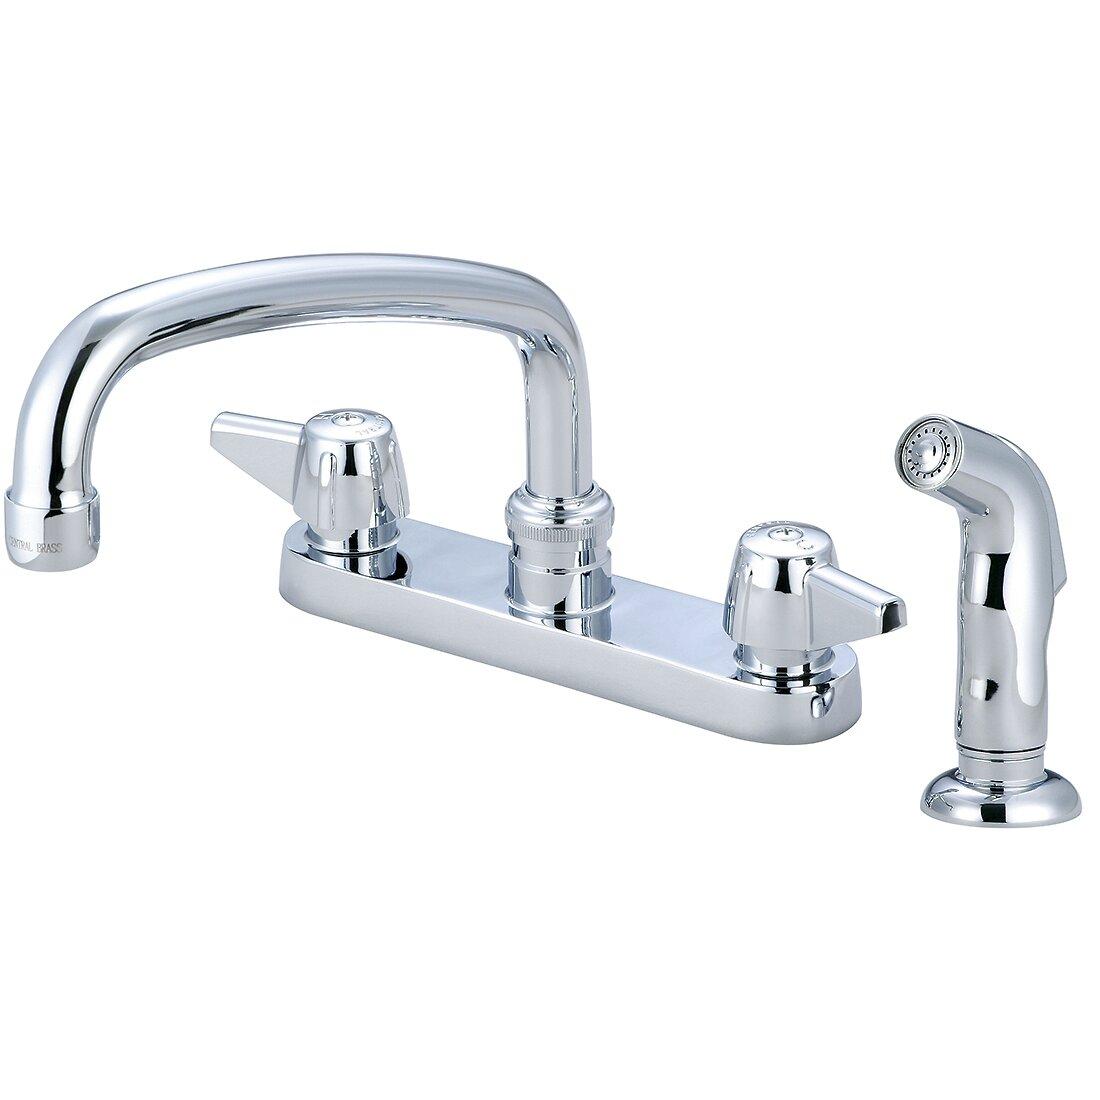 Central Brass Kitchen Faucet